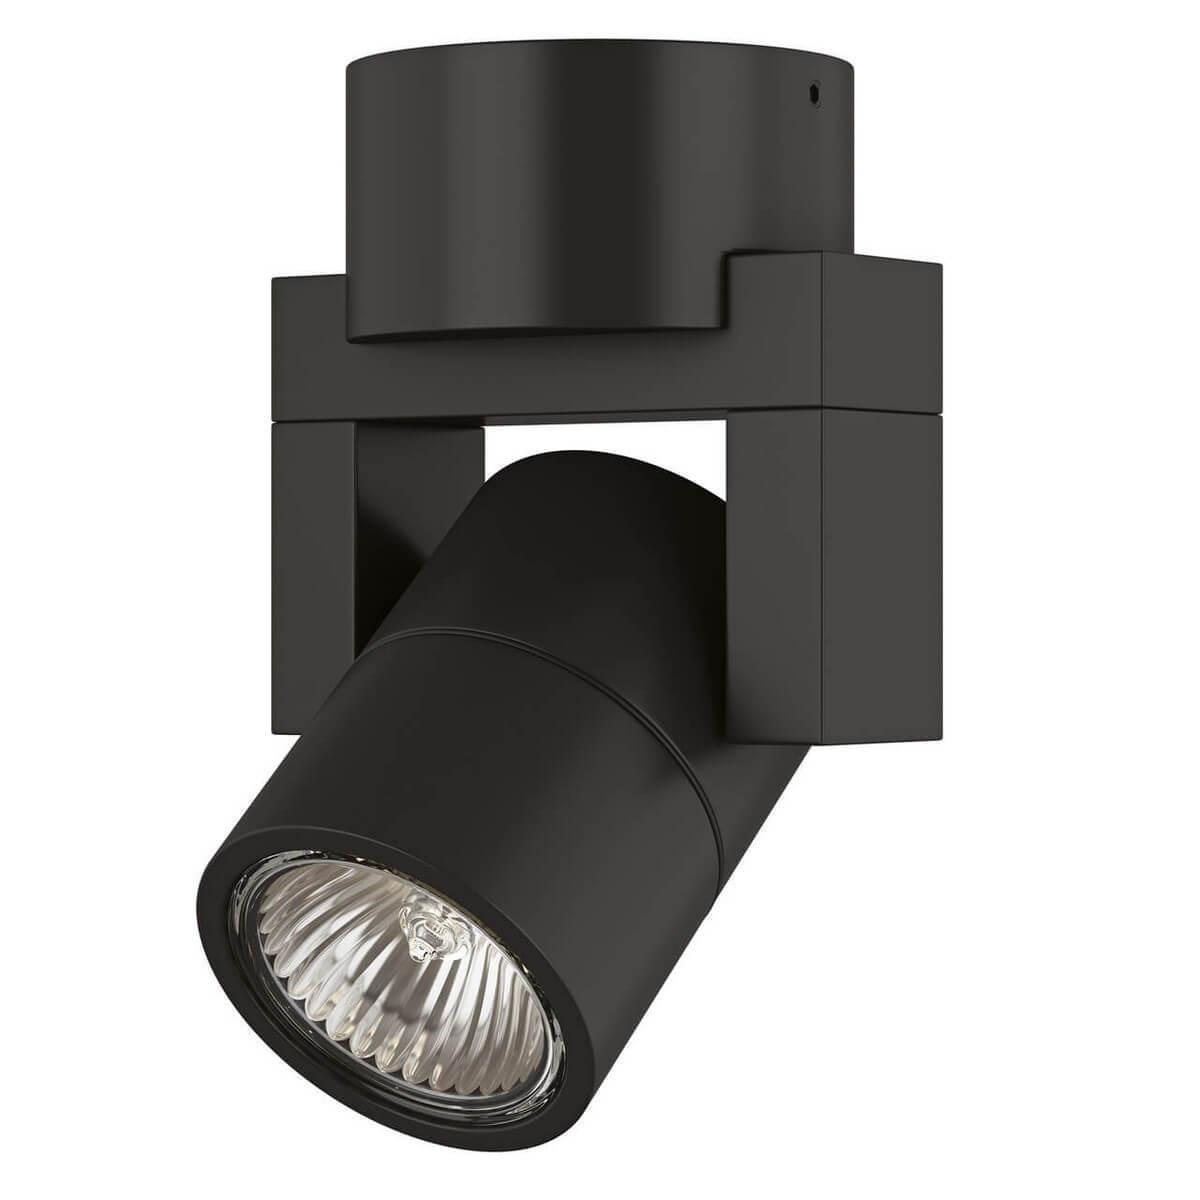 Накладной светильник Lightstar 051047, GU10, 50 Вт светильник donolux sa1541 sa1543 alu